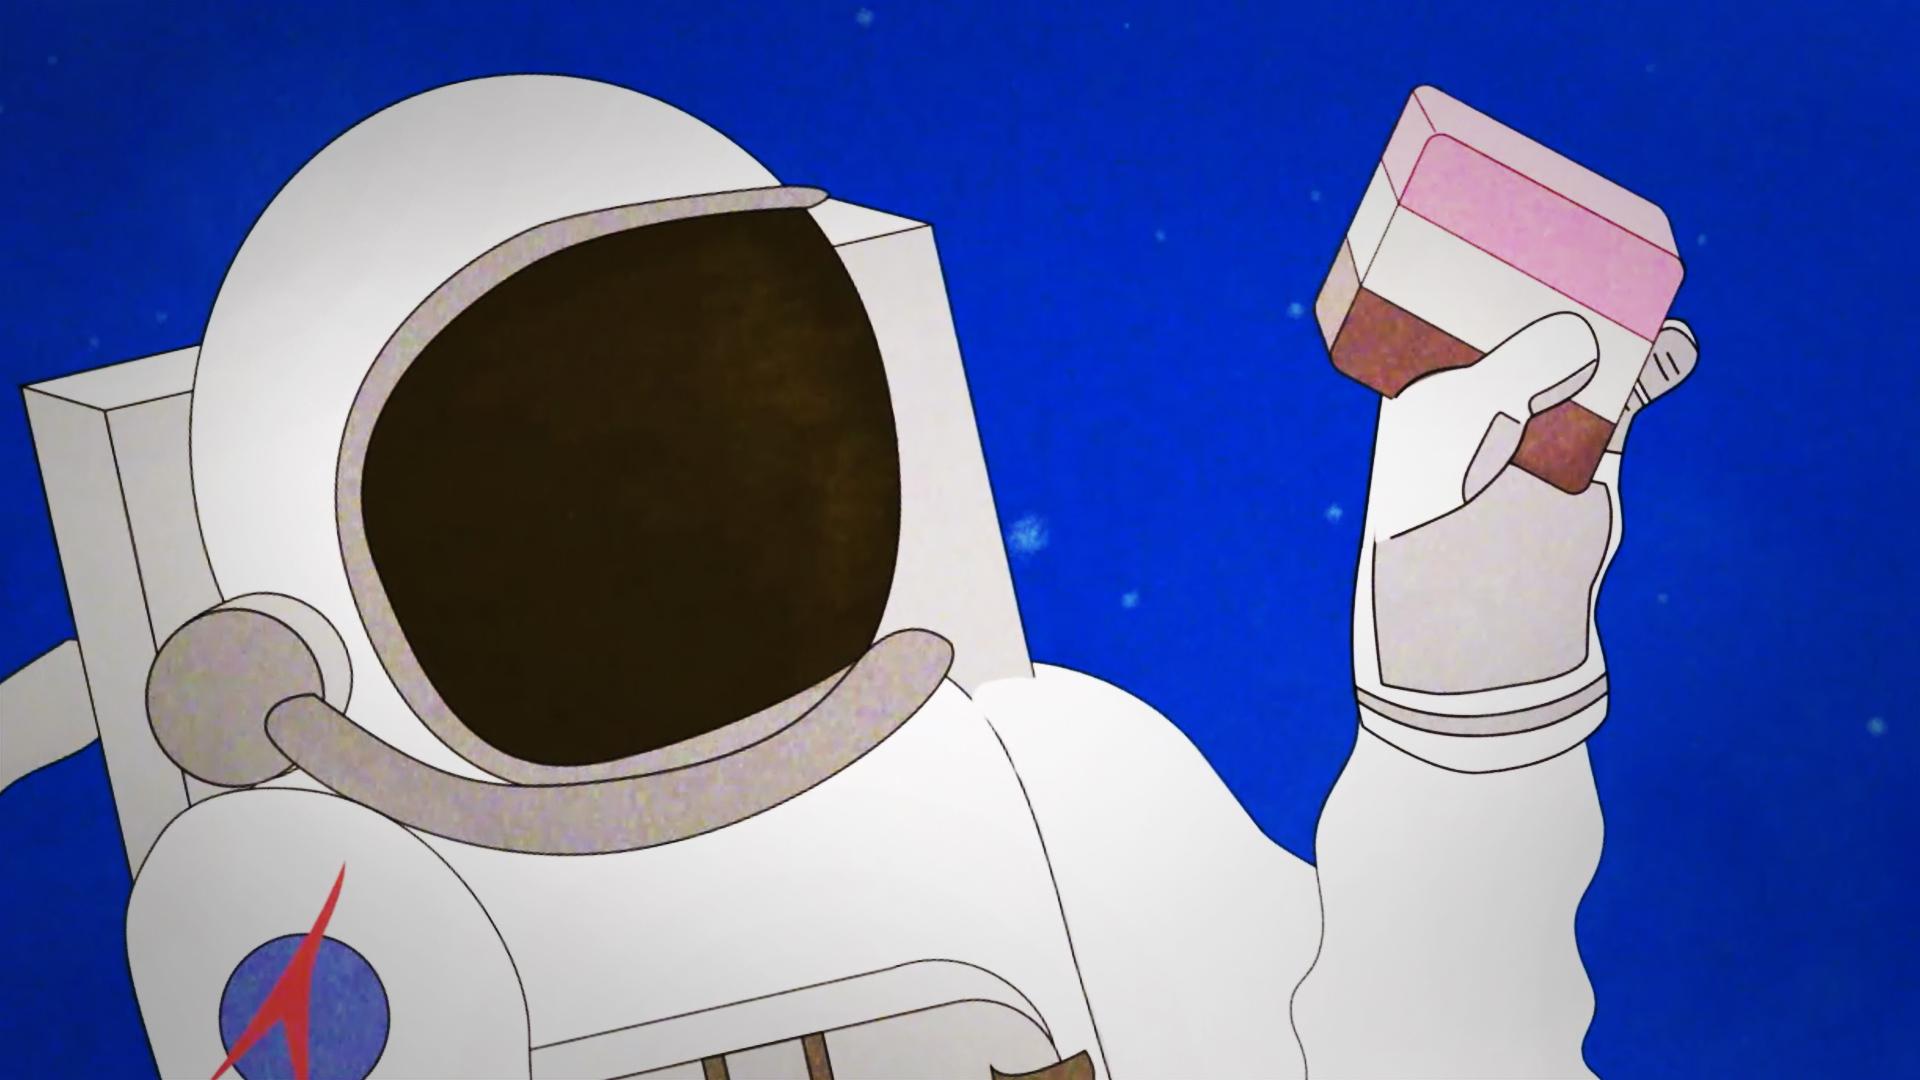 Astronaut ice cream is a lie.